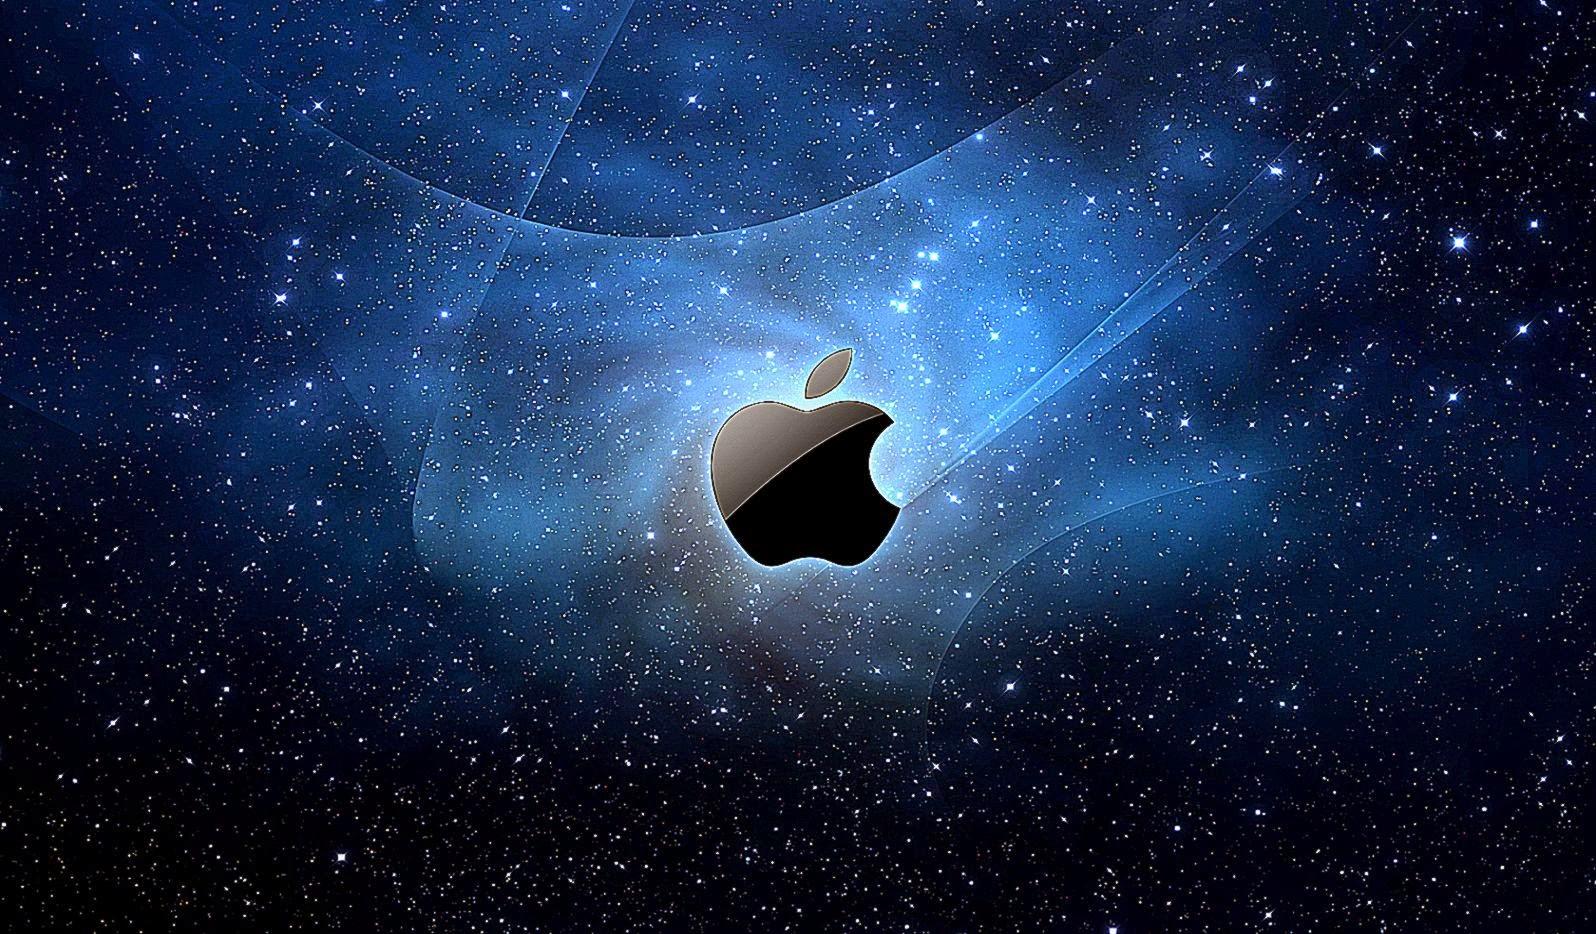 Image Result For Apple Mac Desktop Backgrounds Unique Wallpaper Wallpapersafari